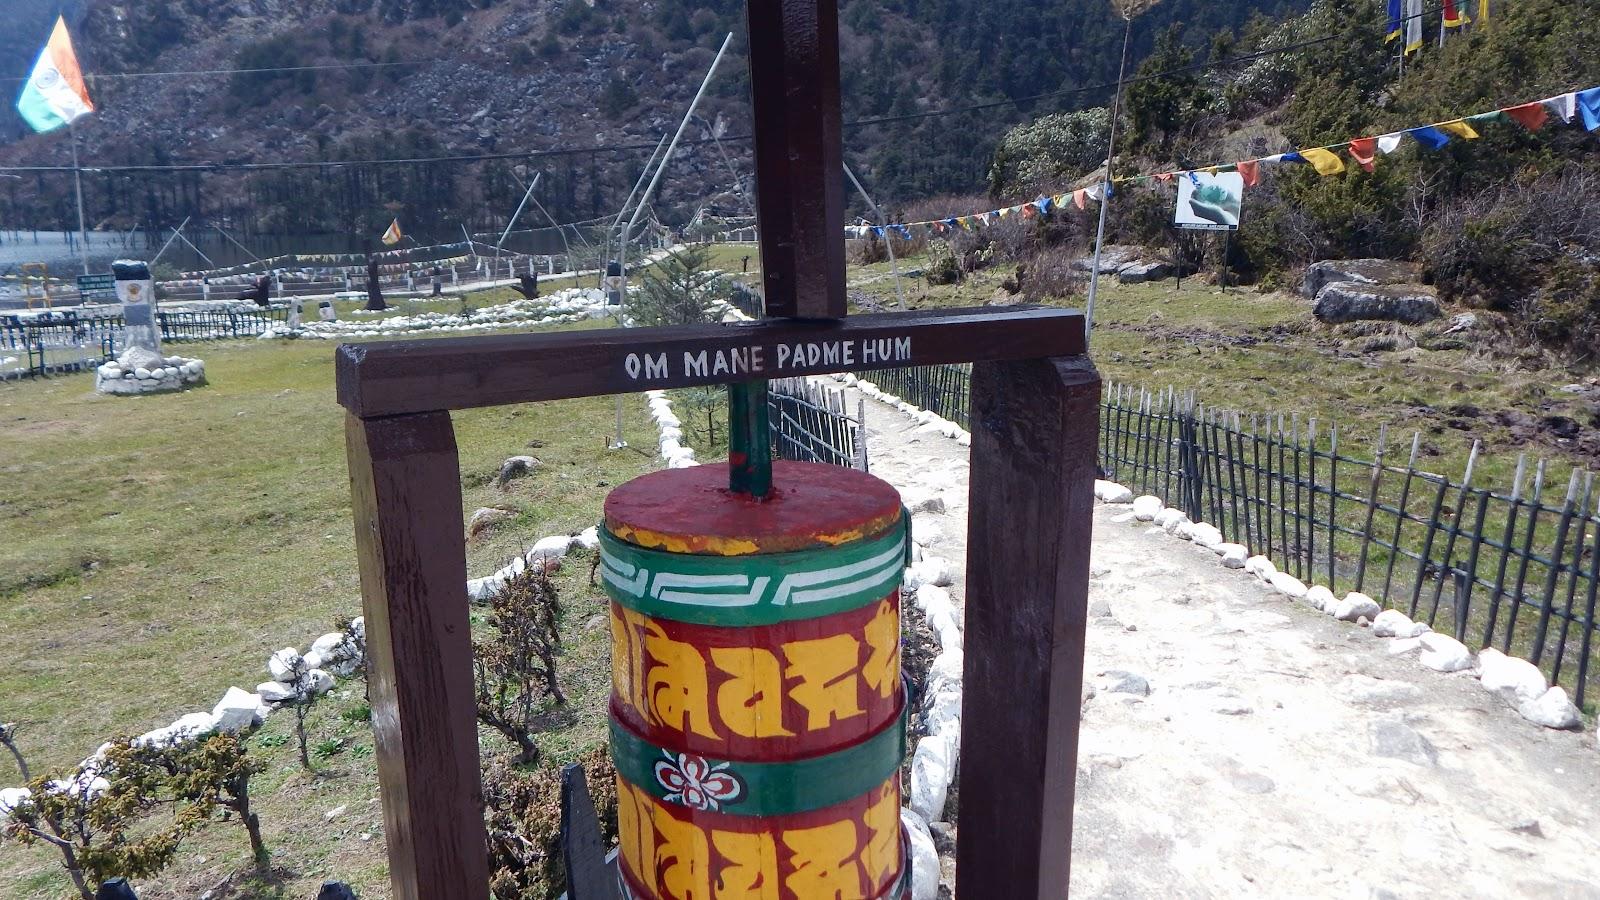 Prayer drum